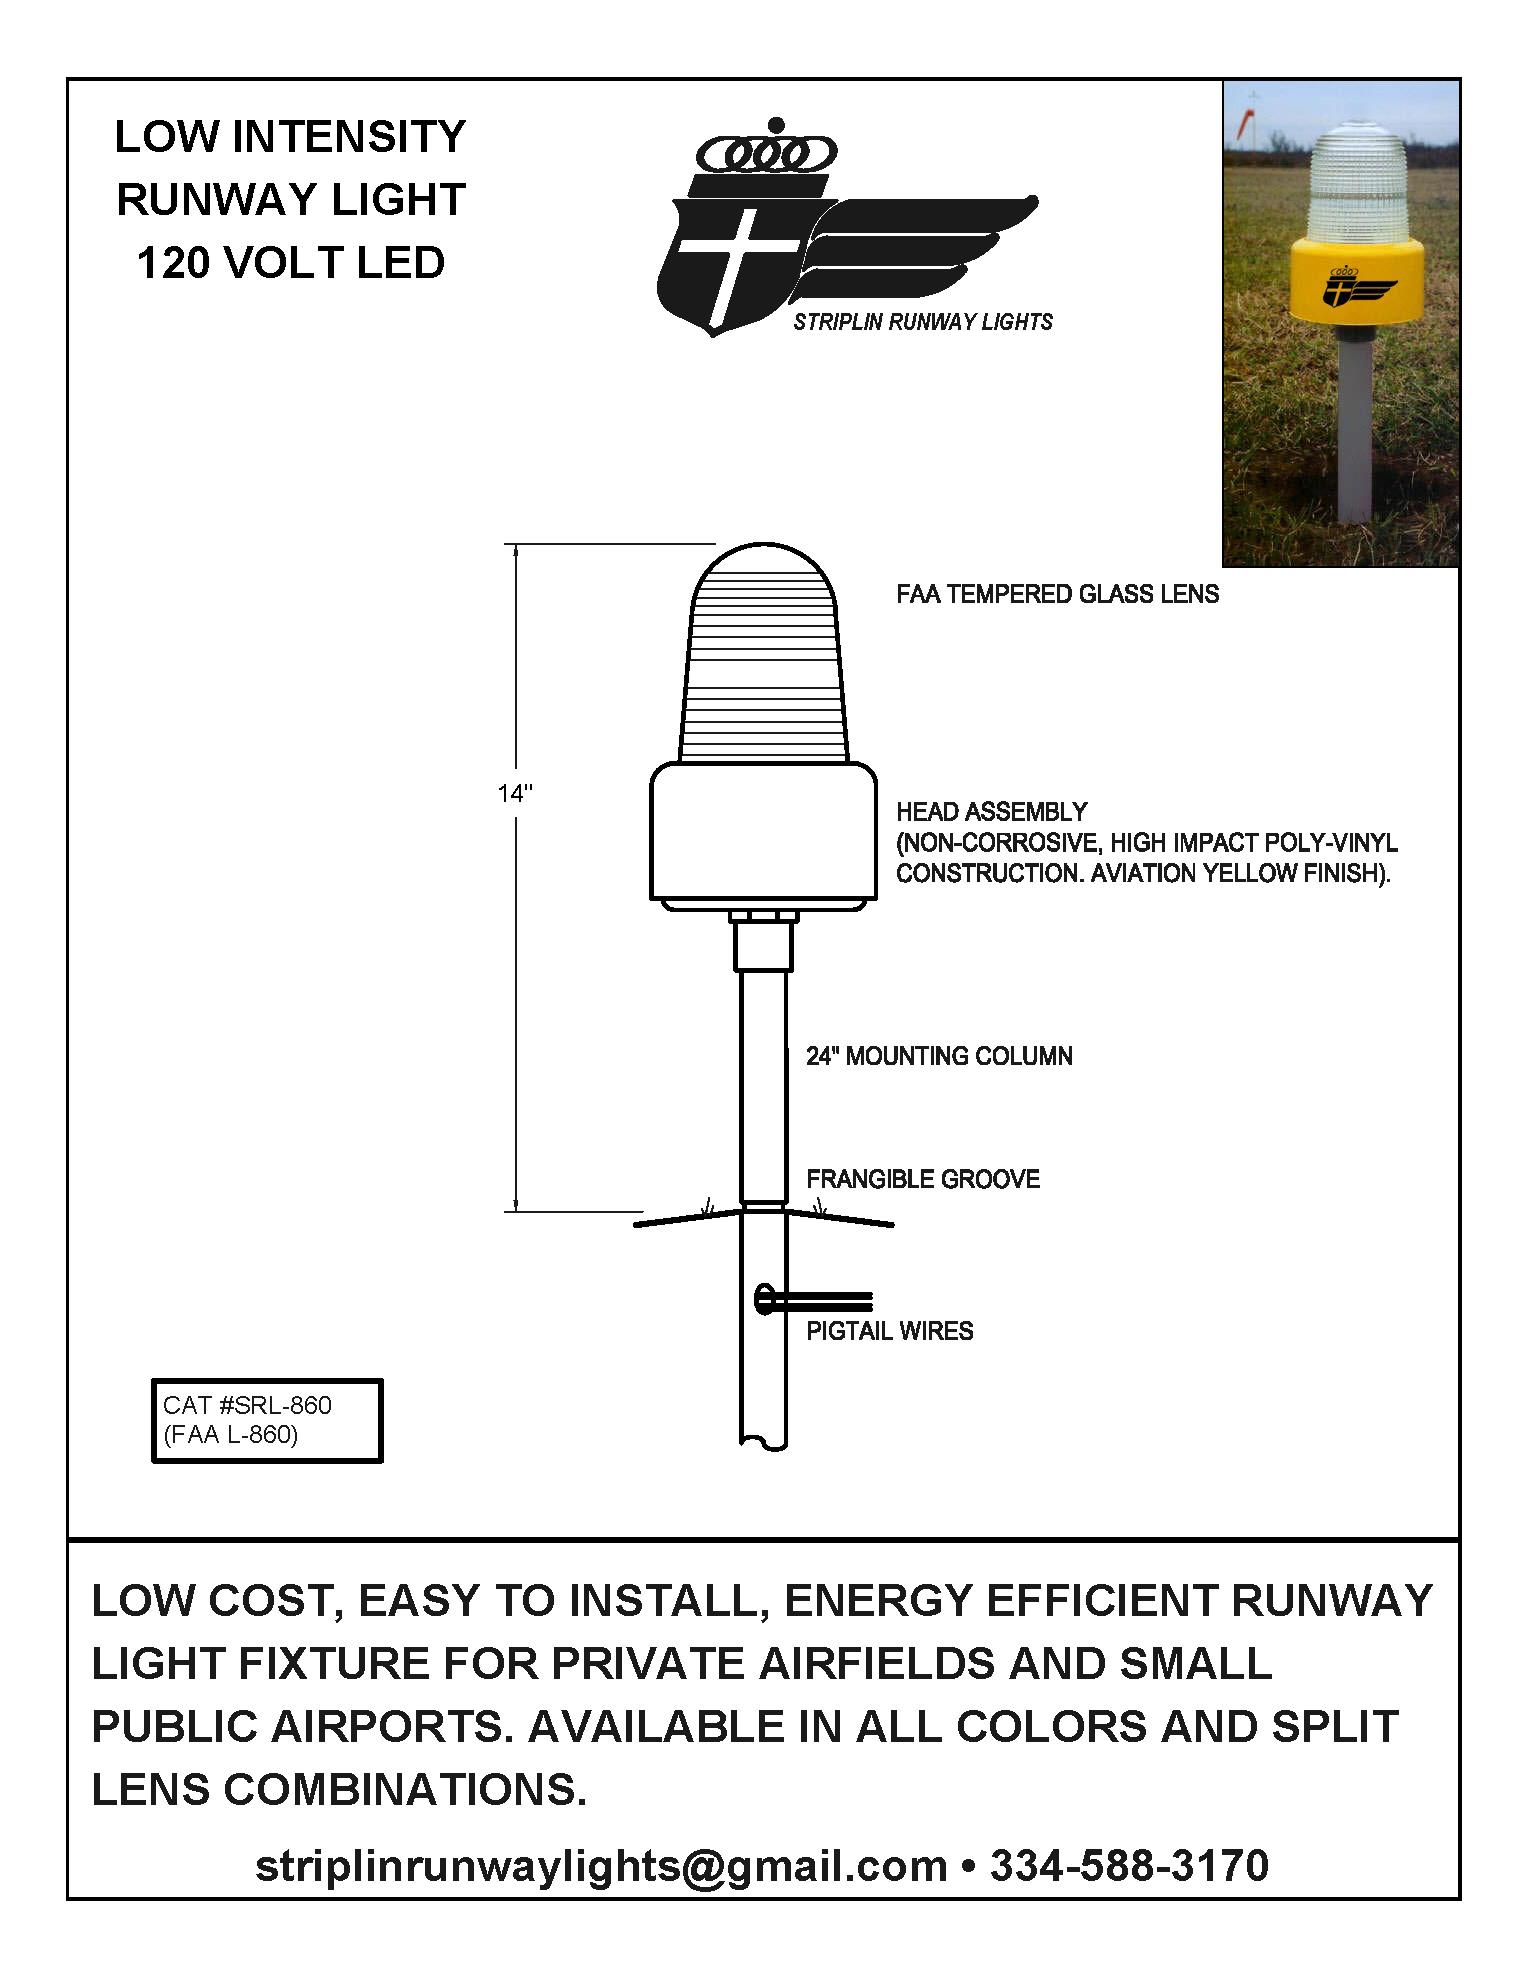 Low Intensity Runway Light: Airport Lighting Wiring Diagram At Aslink.org